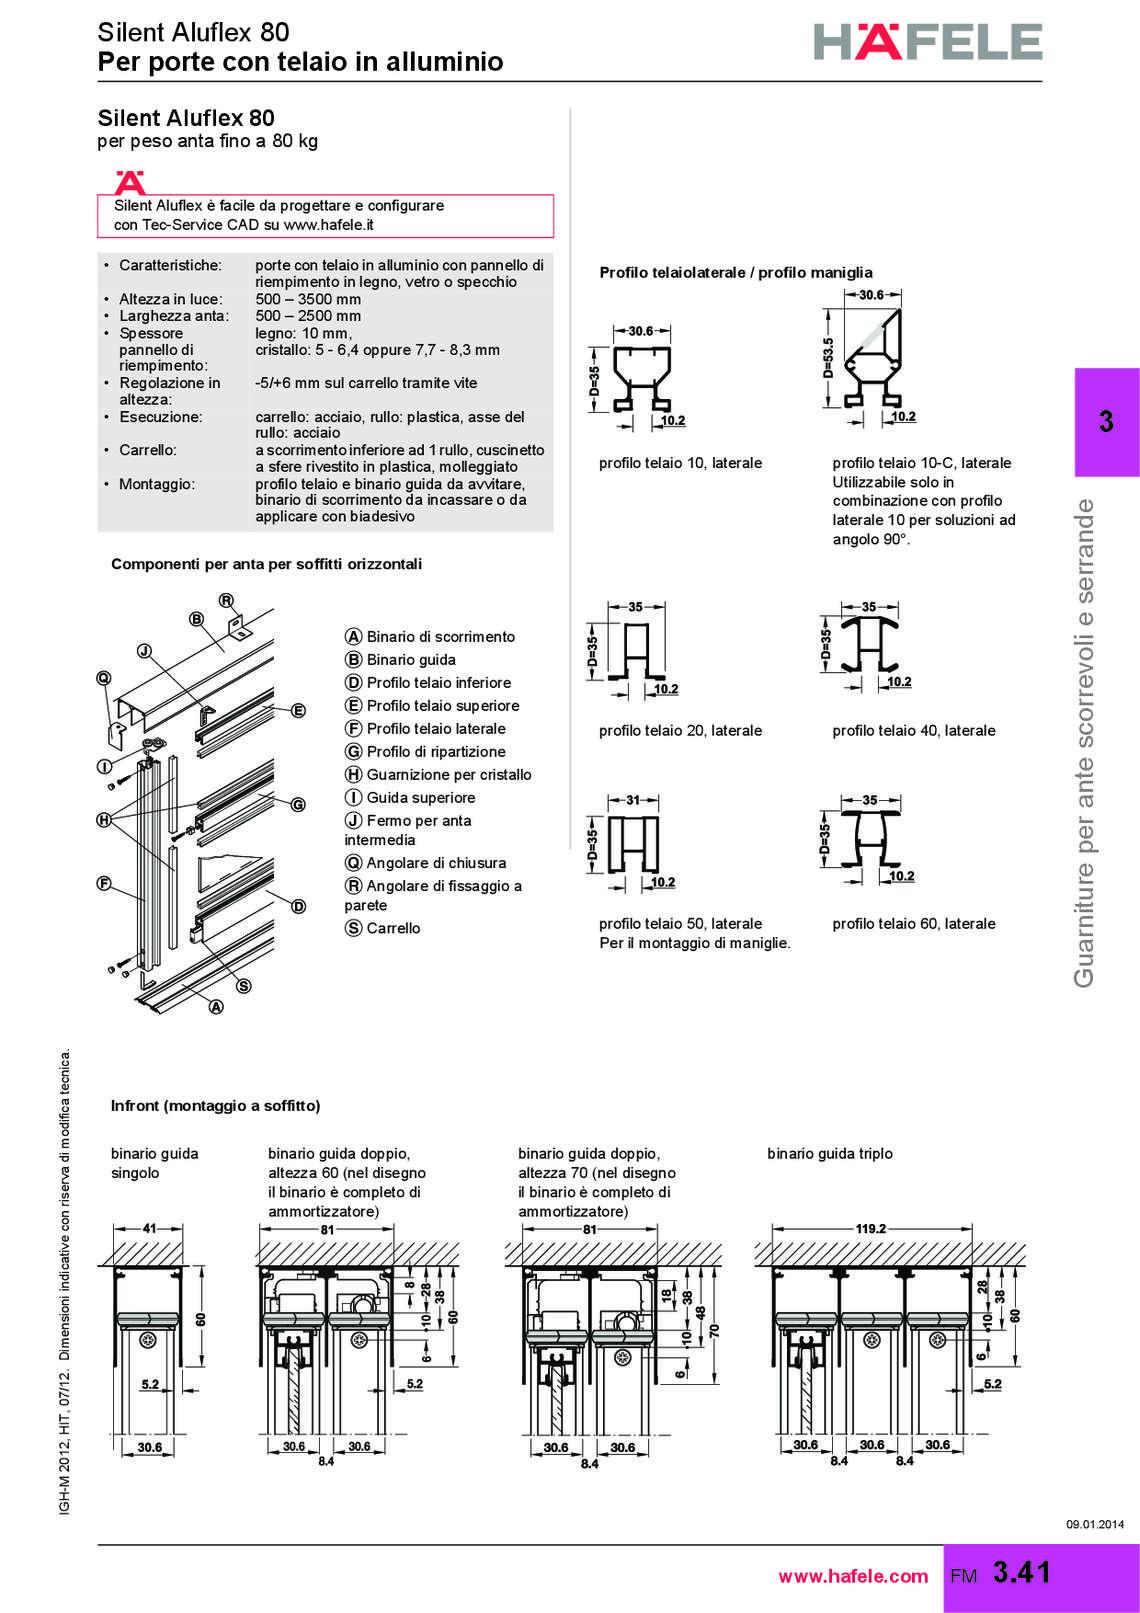 hafele-prodotti-su-misura_81_054.jpg